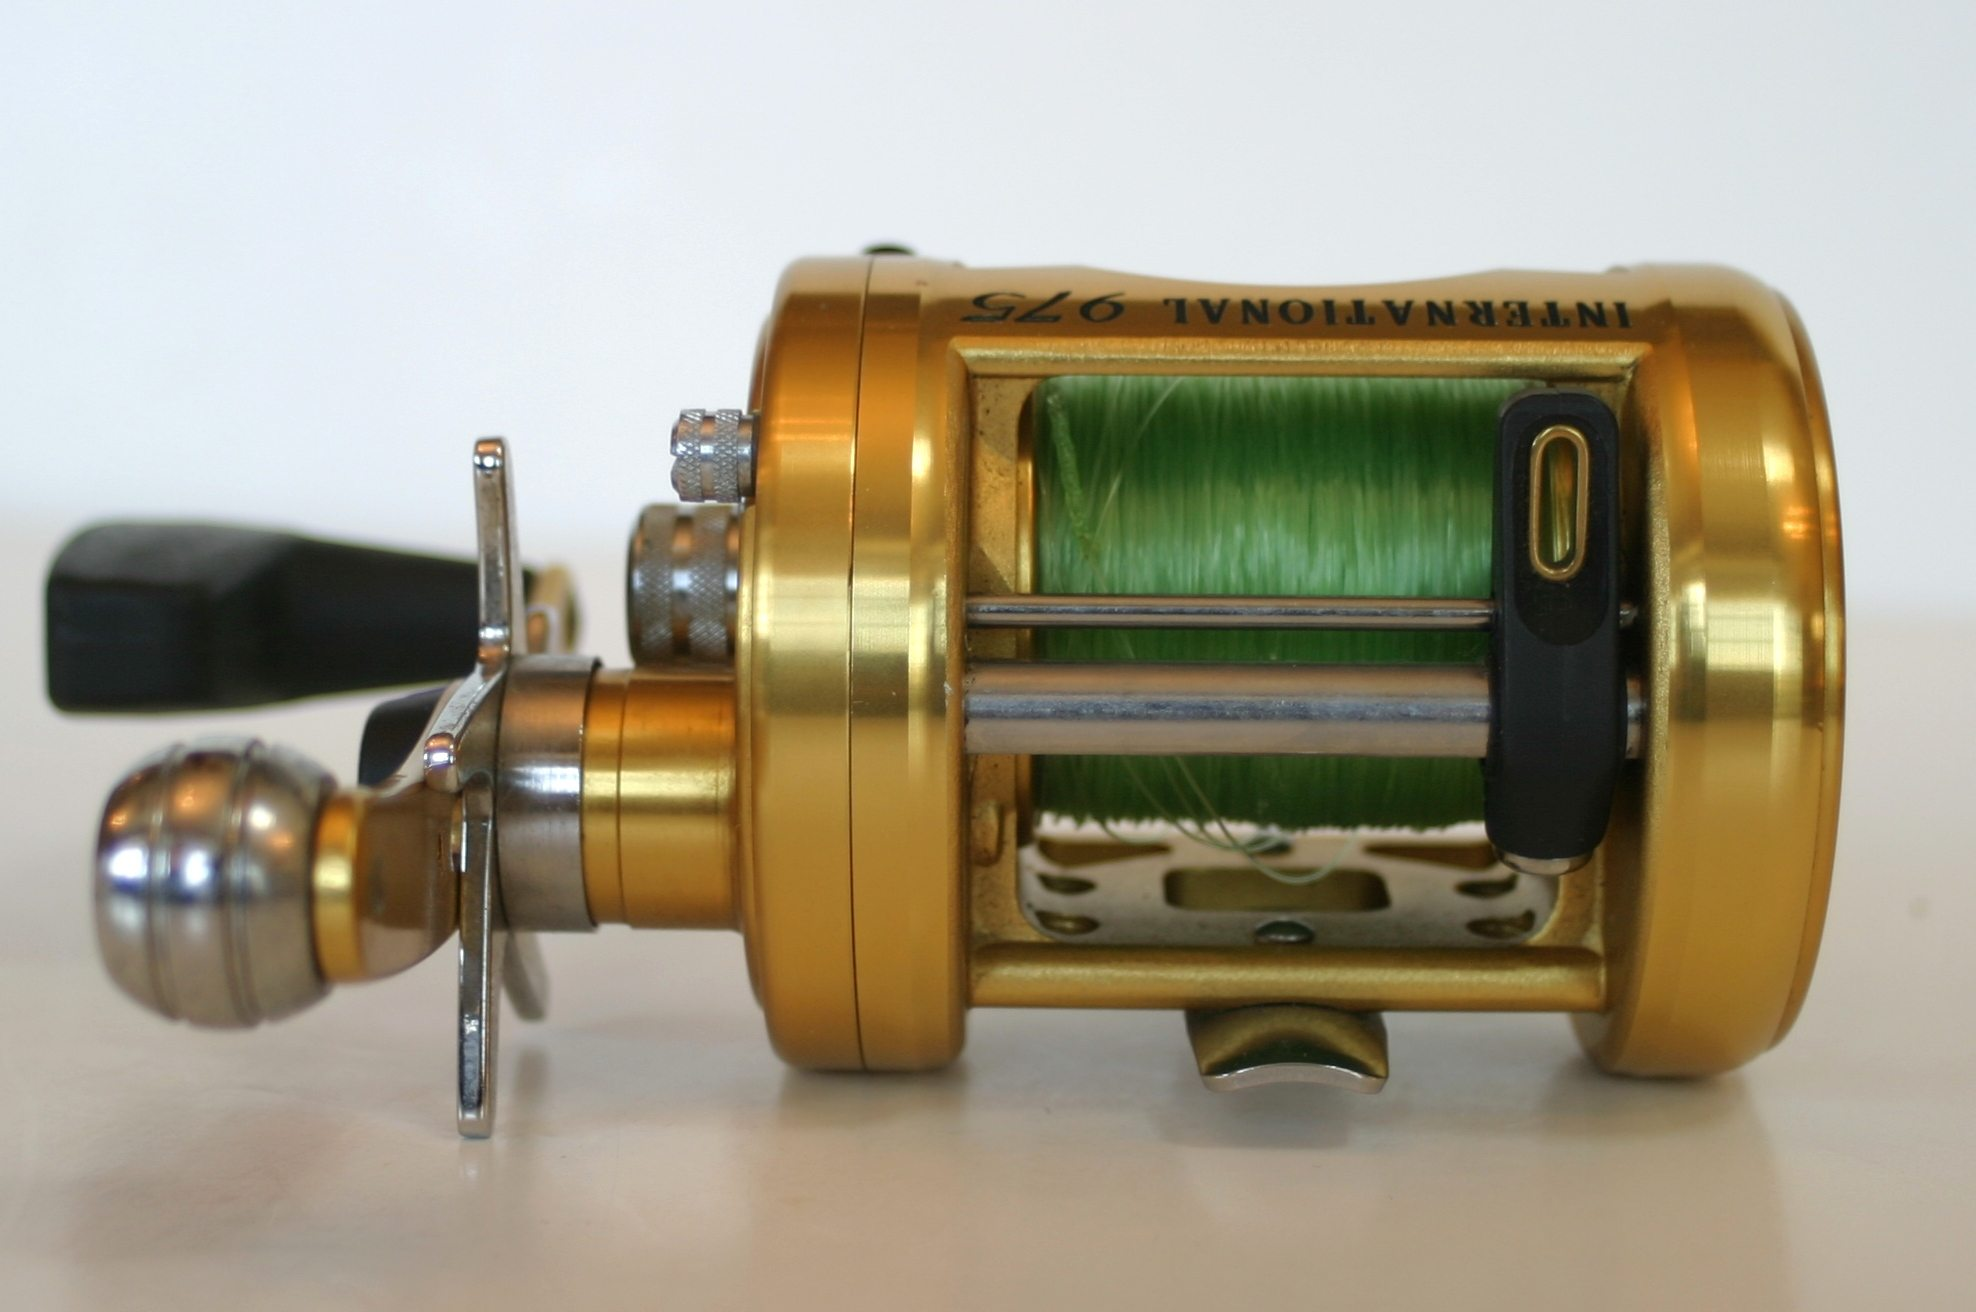 Penn reels international 975 bait caster fishing reel made for Fishing reels made in usa